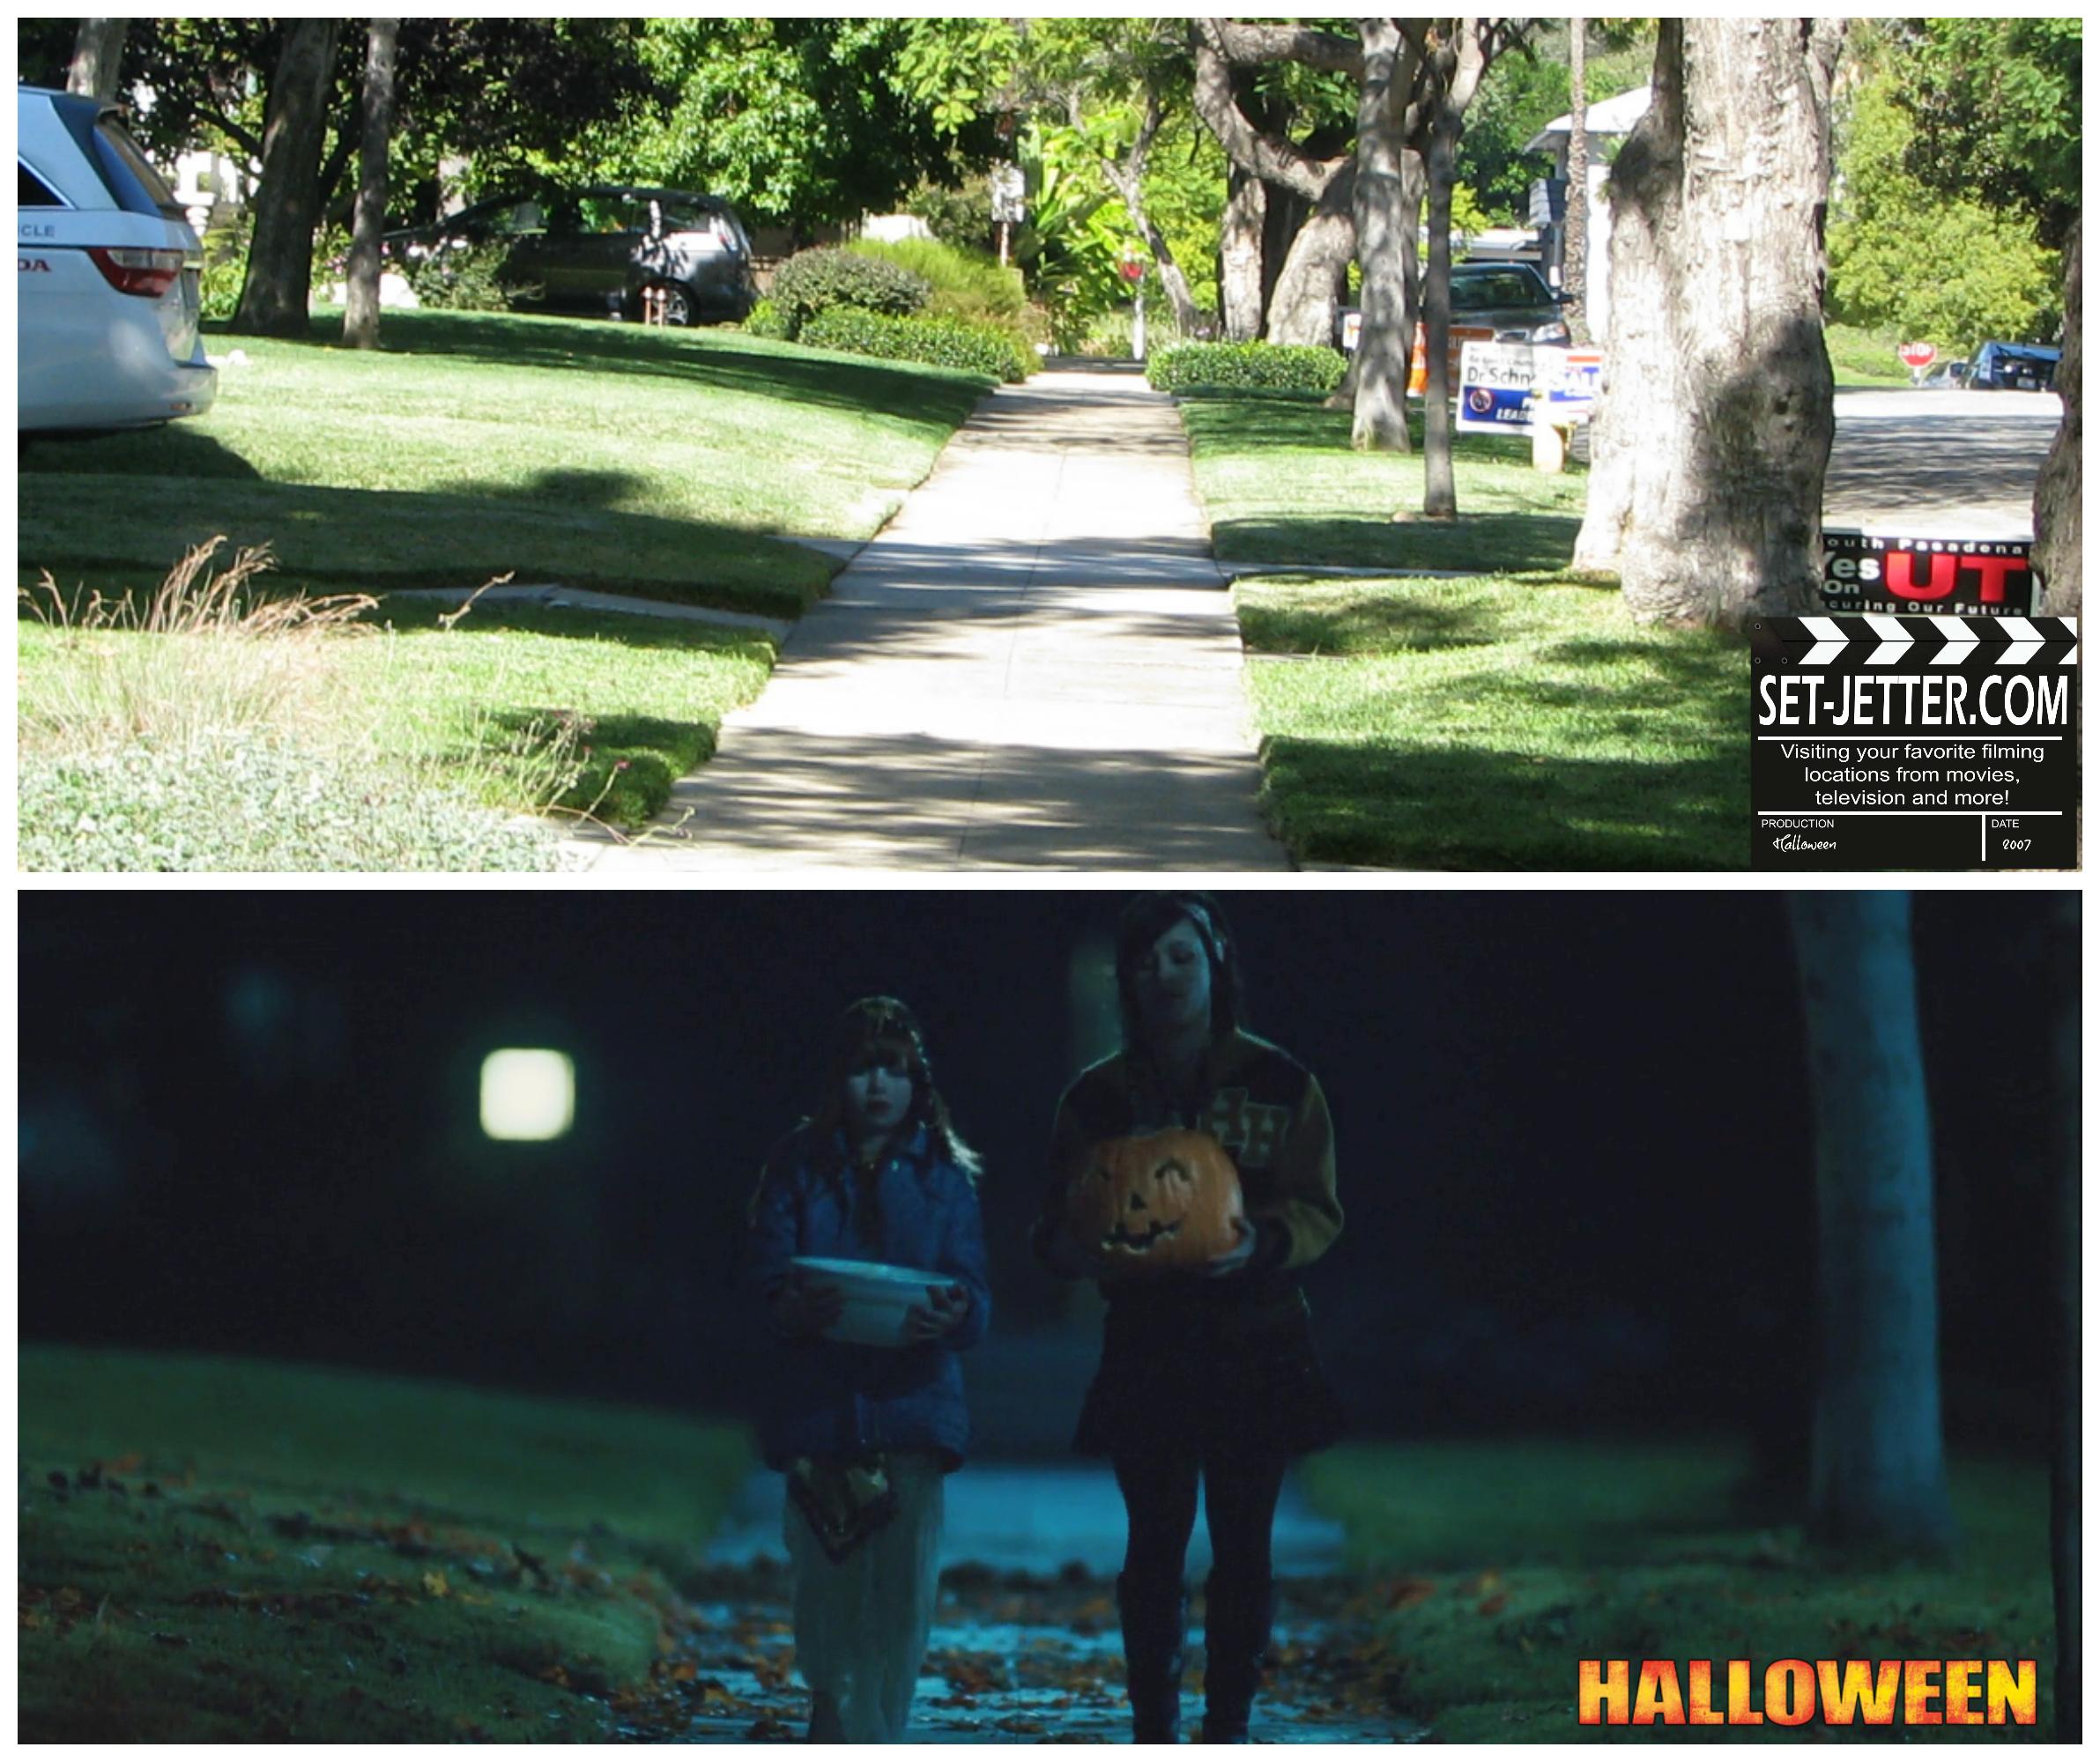 Halloween 2007 comparison 60.jpg